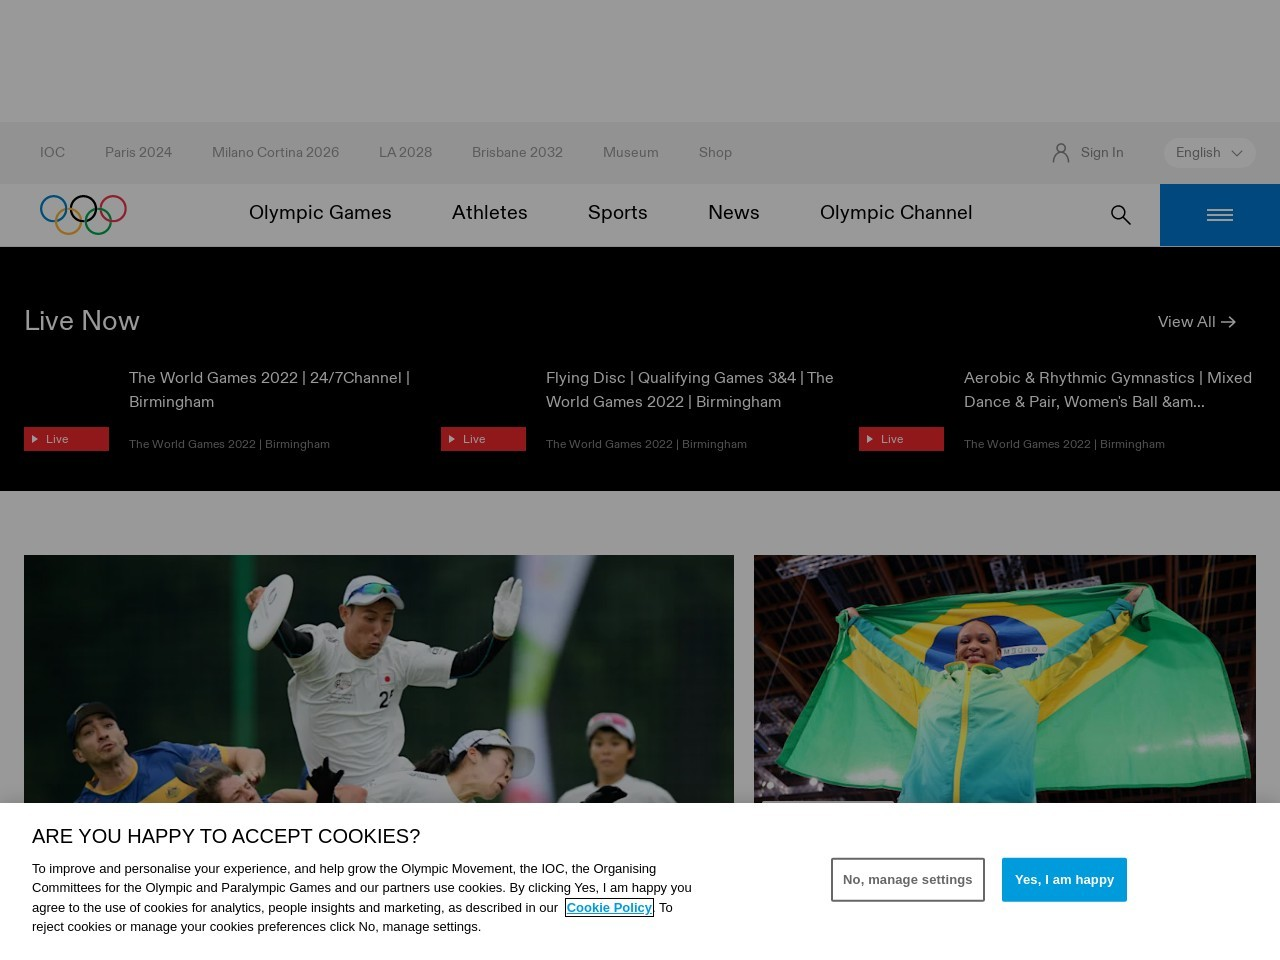 国际奥委会Olympics | Olympic Games,